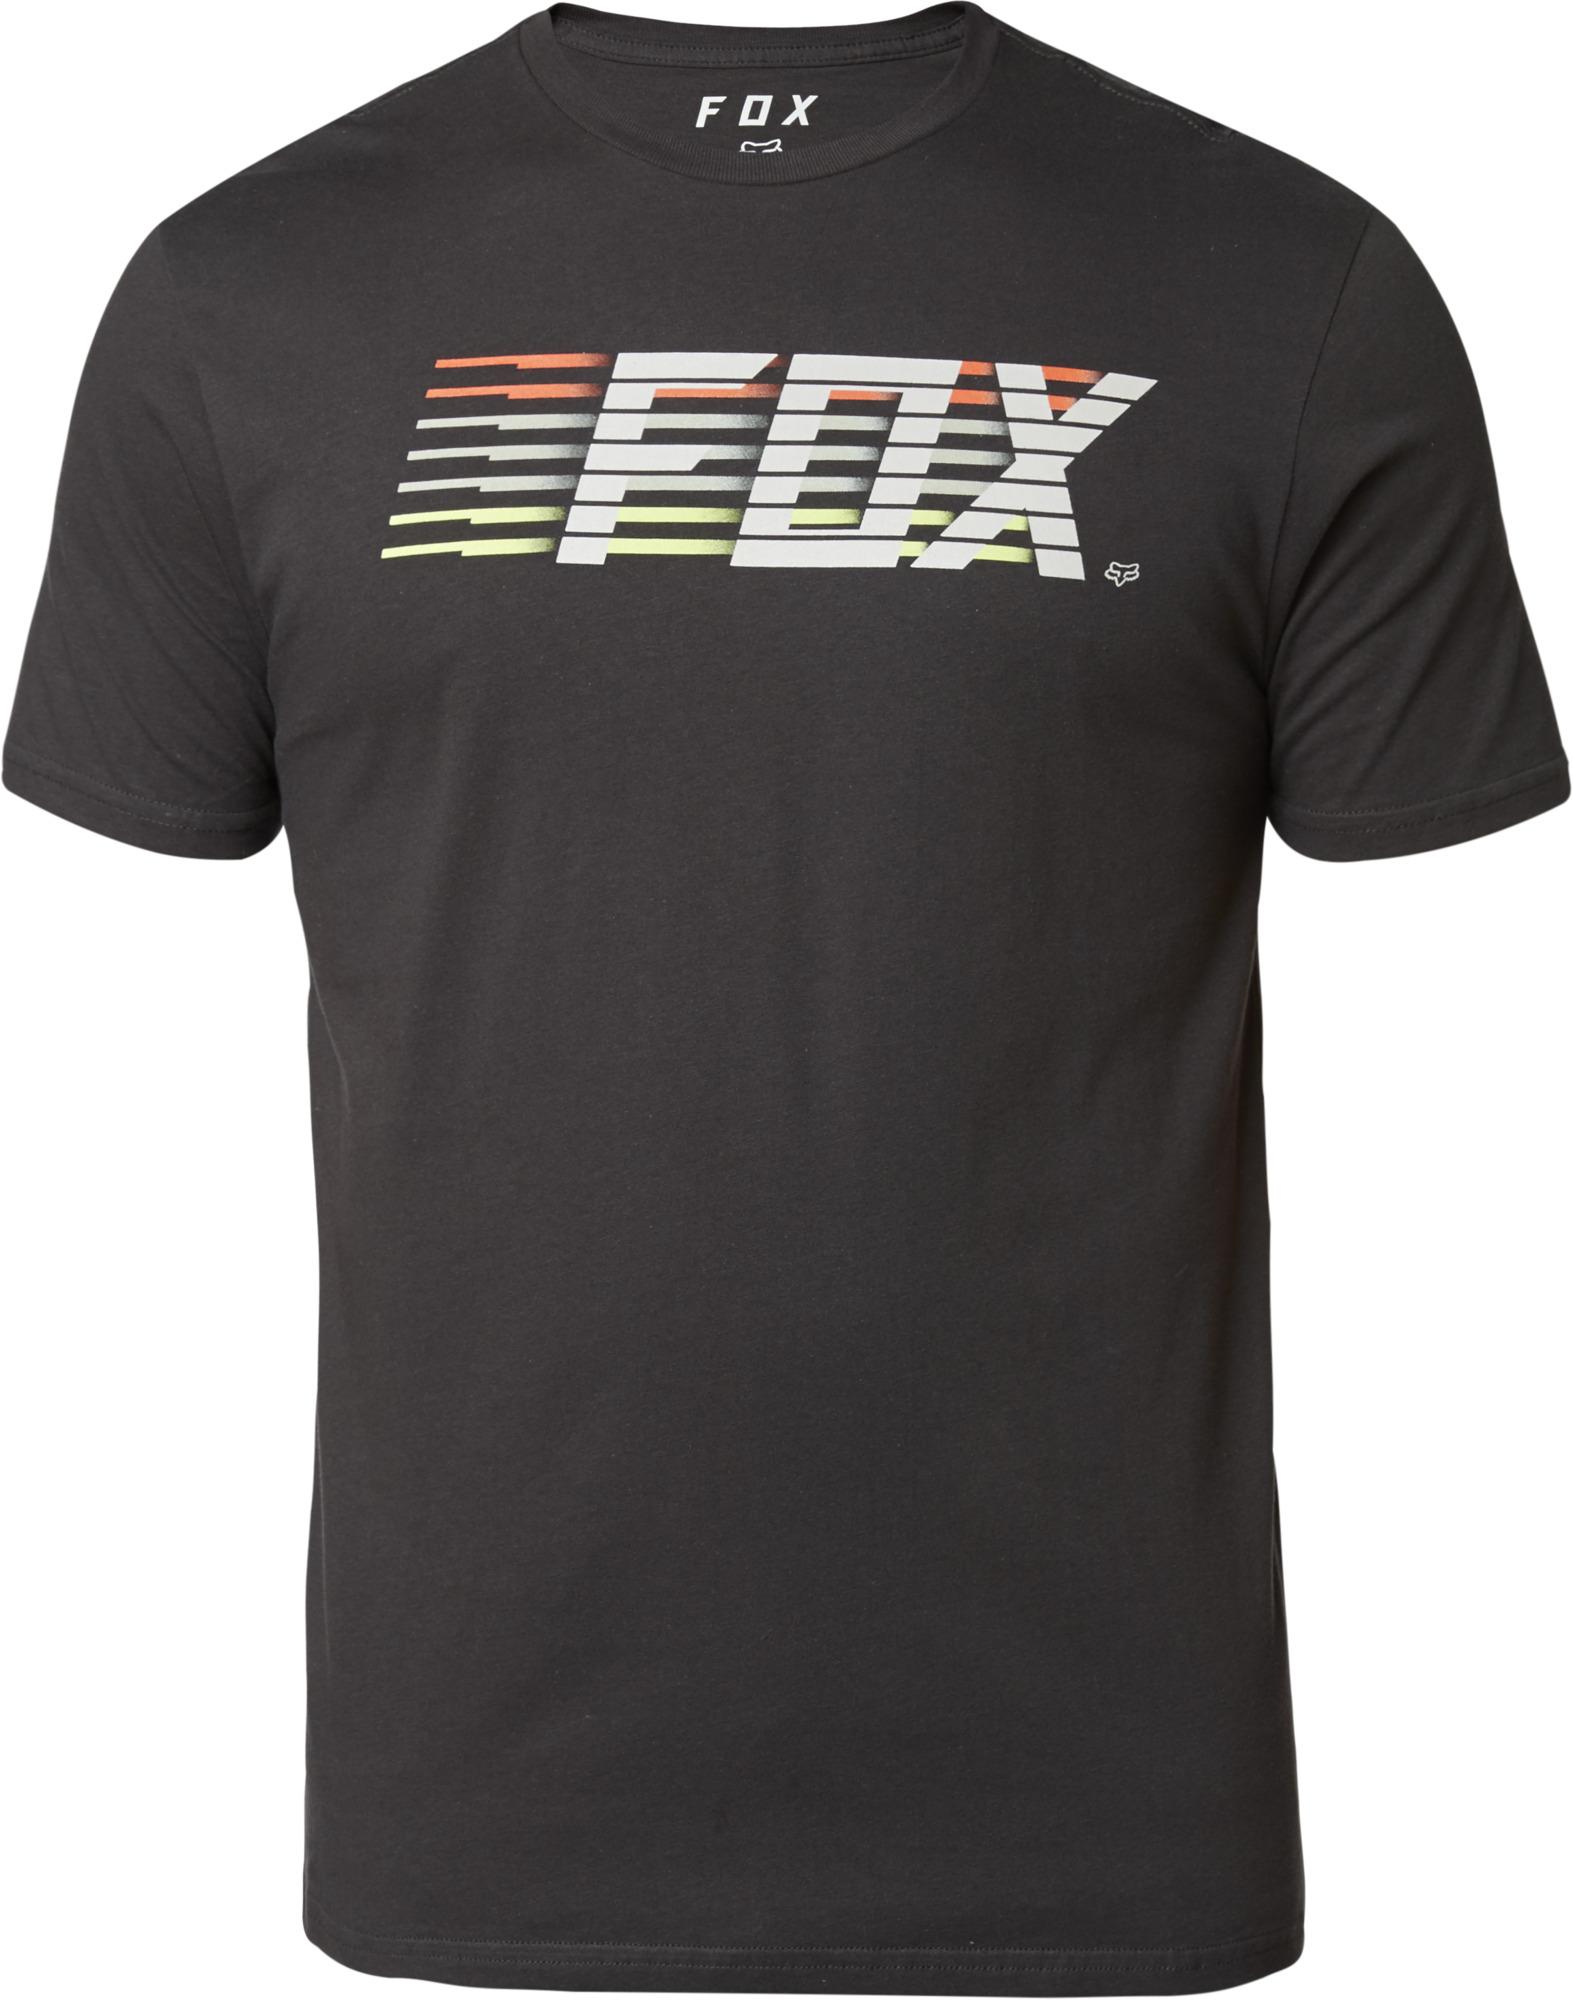 Black Fox Lightspeed Moth Premium Short Sleeve Mens Cycling Top